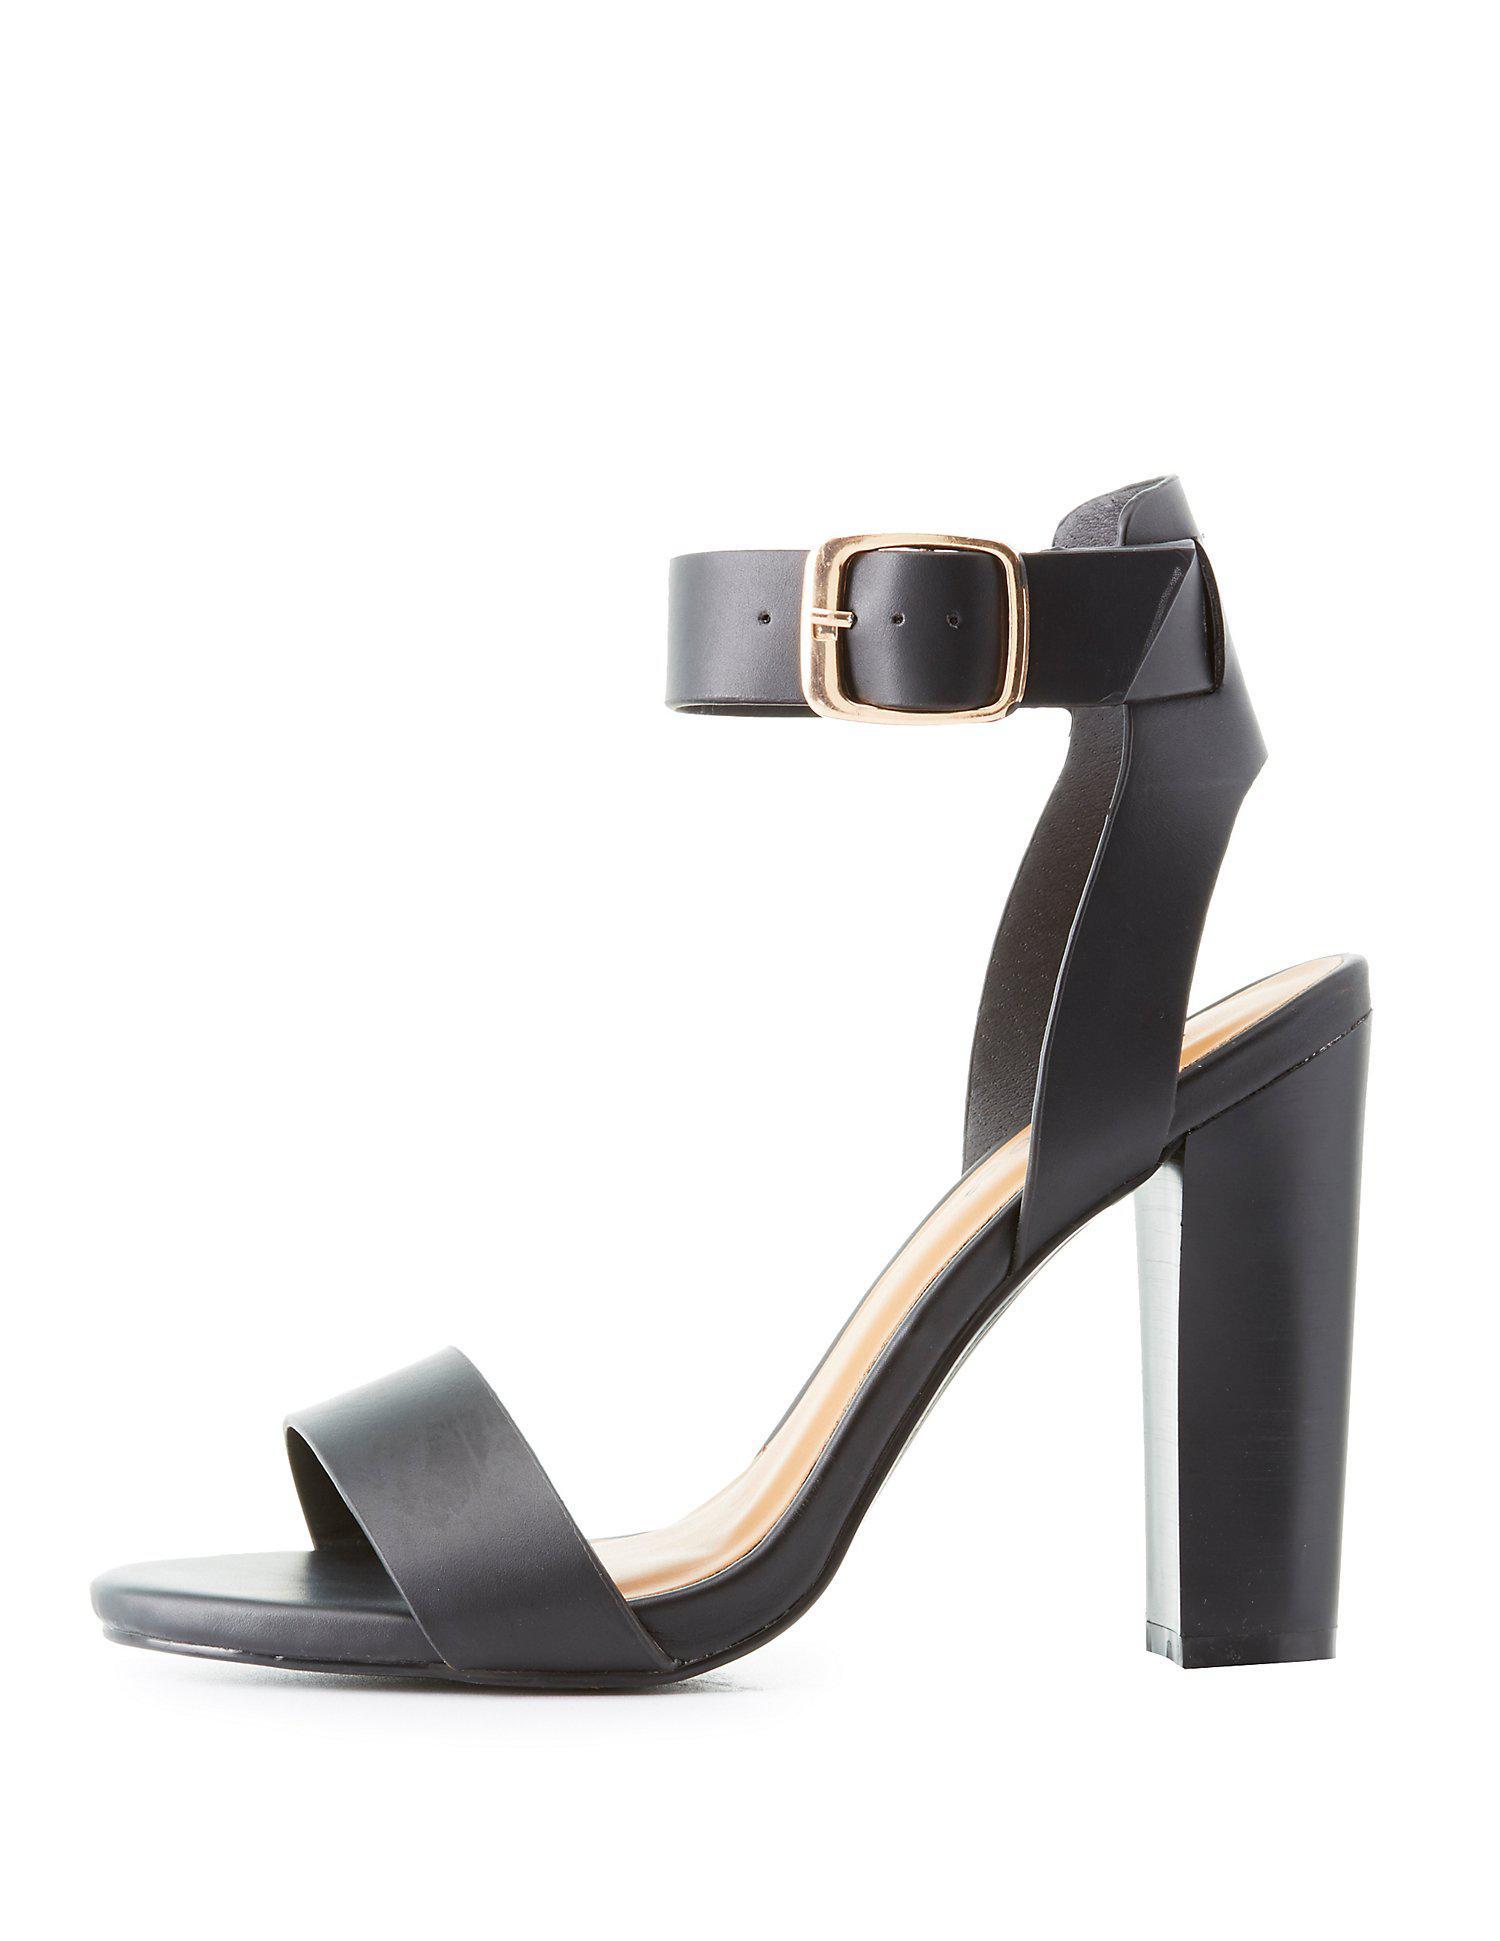 08e1eea91b0 Lyst - Charlotte Russe Bamboo Two-piece Block Heel Sandals in Black